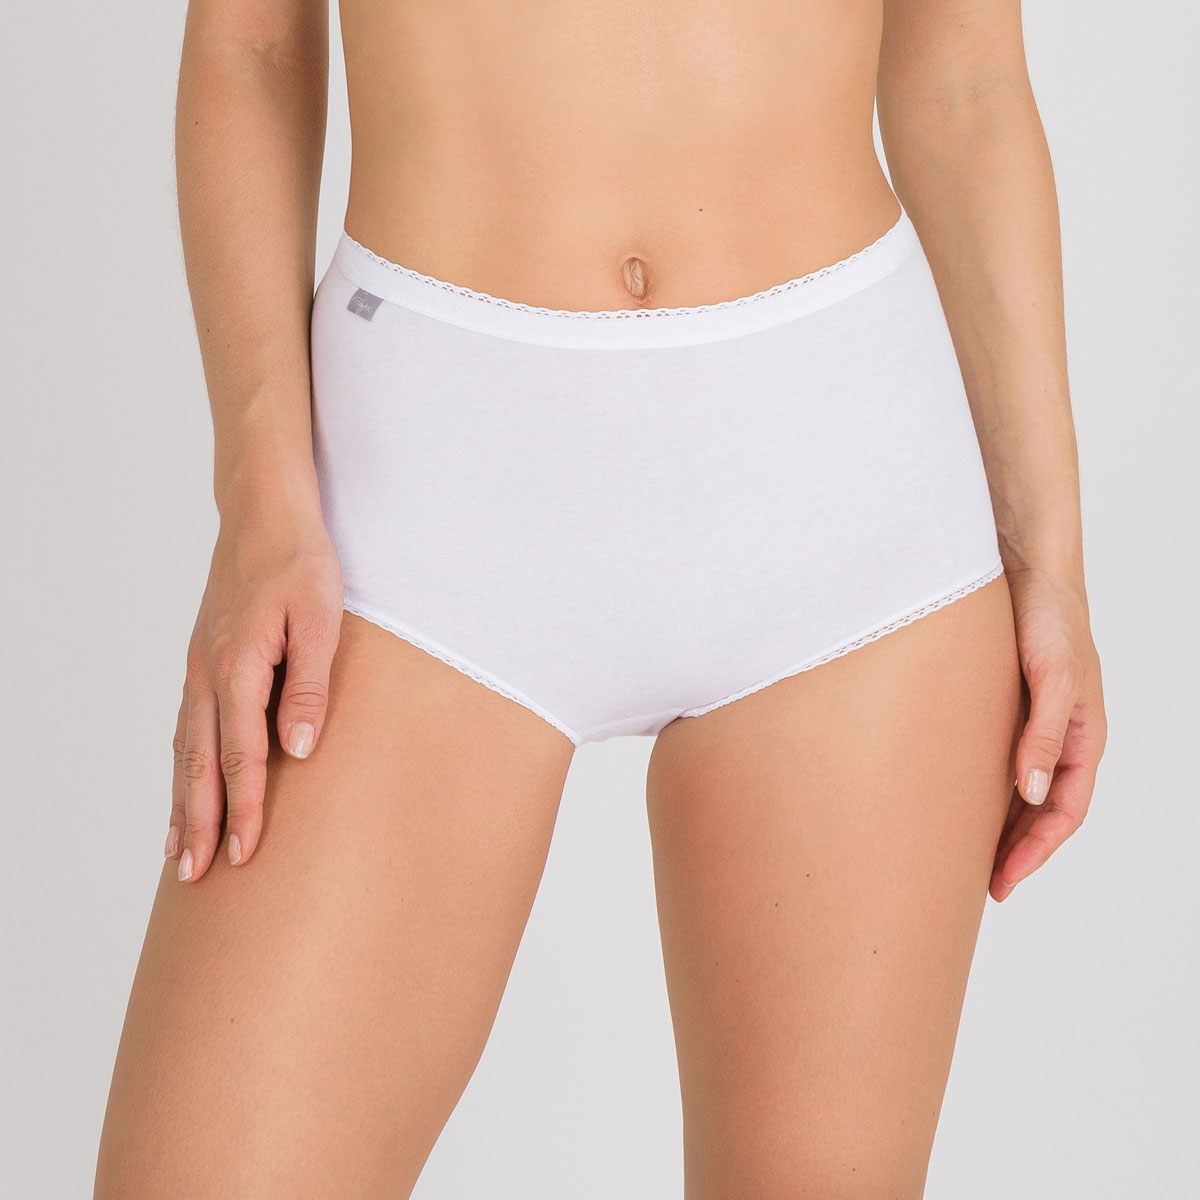 Pacco da 3 Slip Maxi basico bianchi - Cotone - PLAYTEX